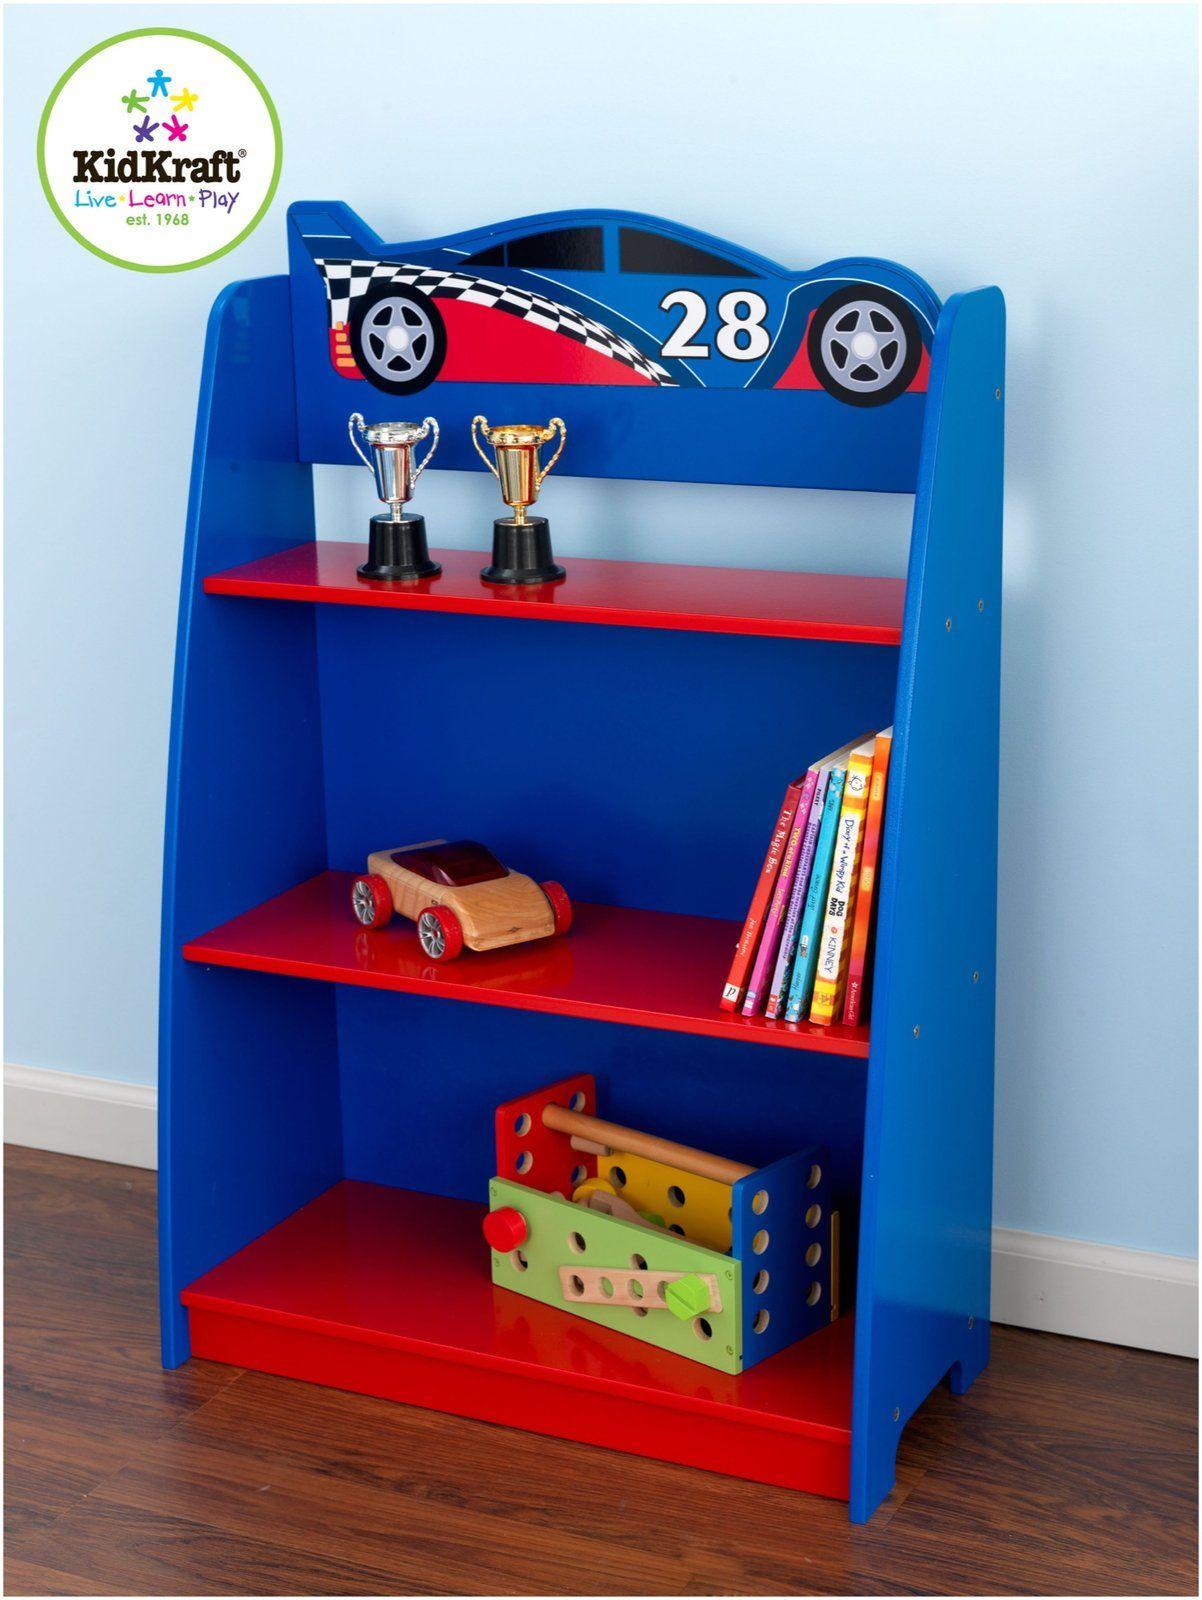 KidKraft Racecar Bookcase Made of composite wood materials